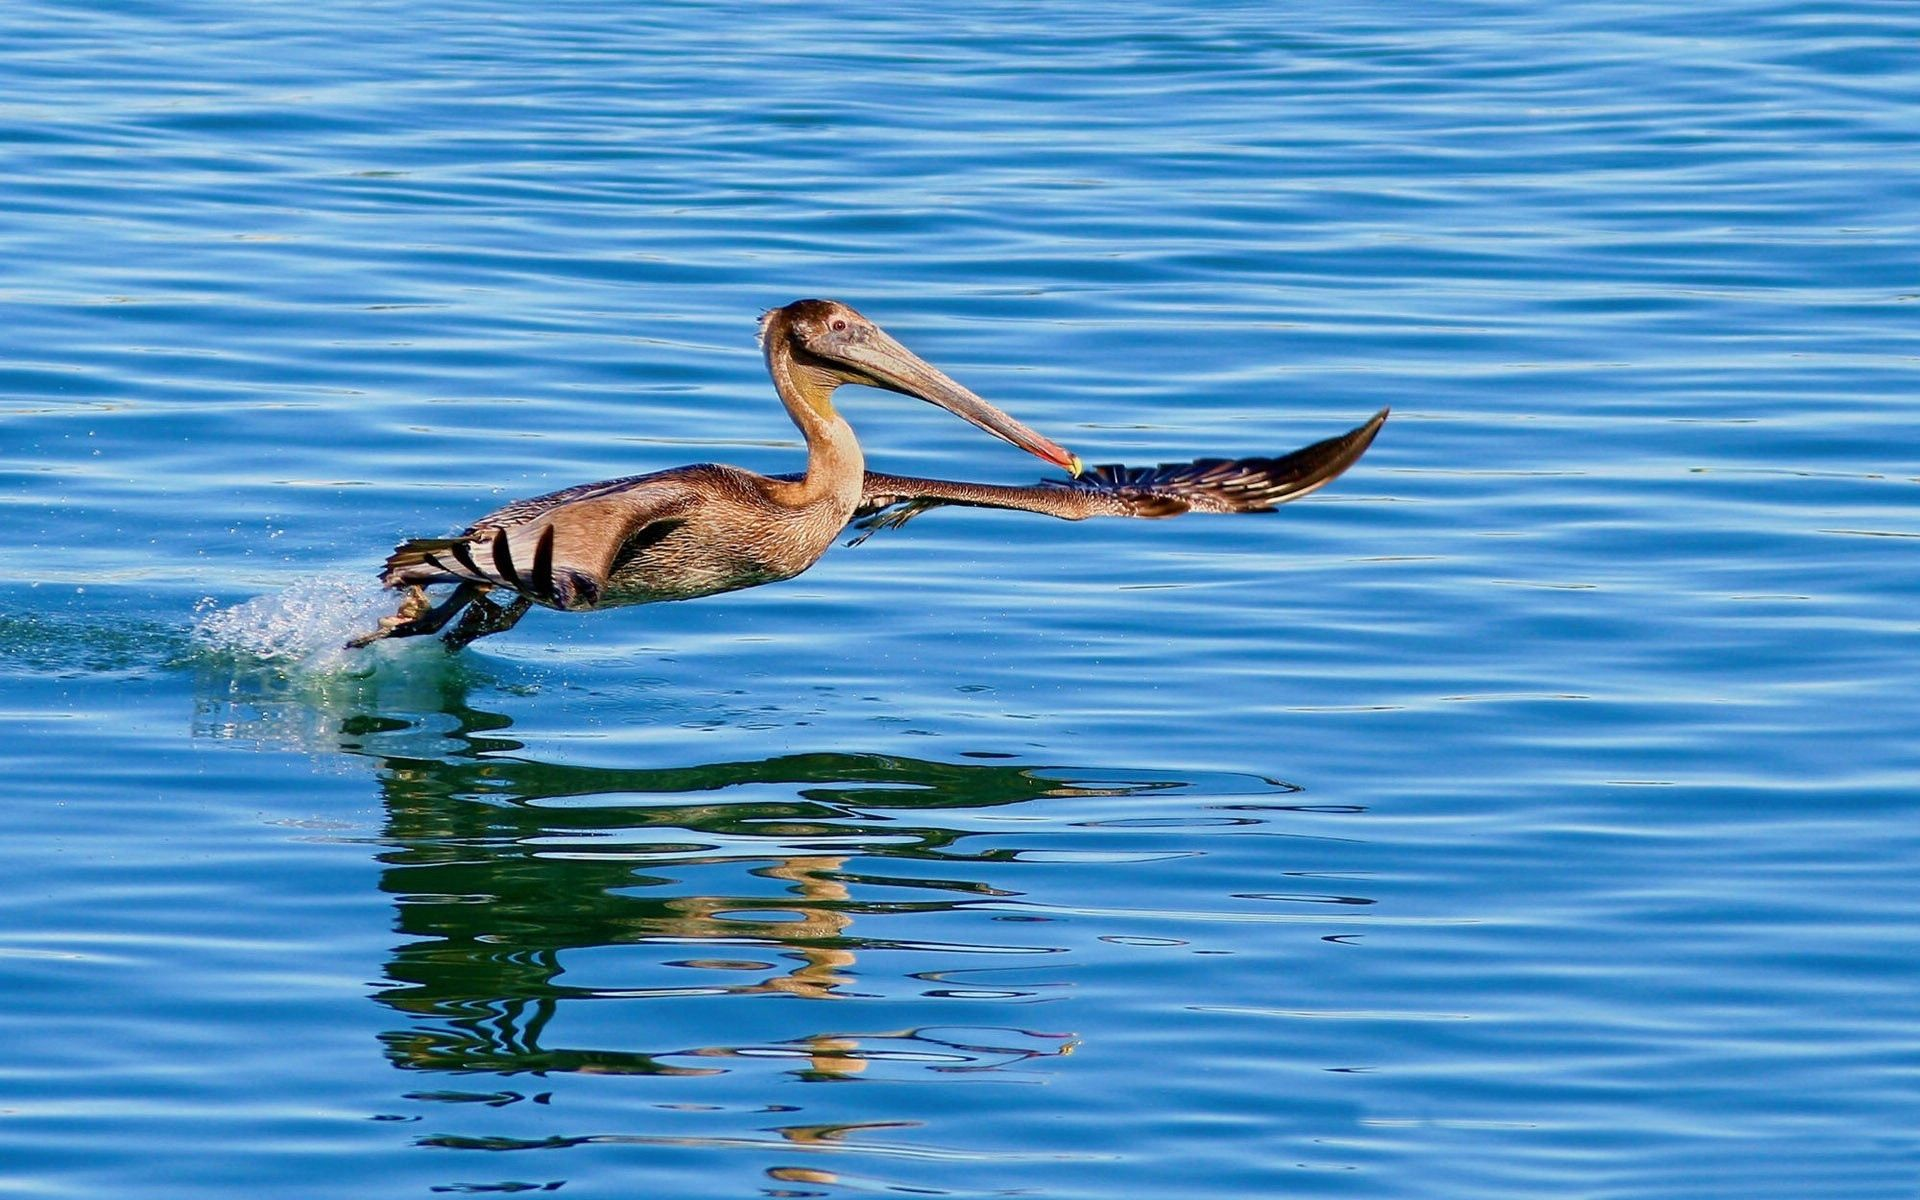 70214 download wallpaper Animals, Pelican, Bird, Sea, Water, To Swim, Swim, Flight screensavers and pictures for free